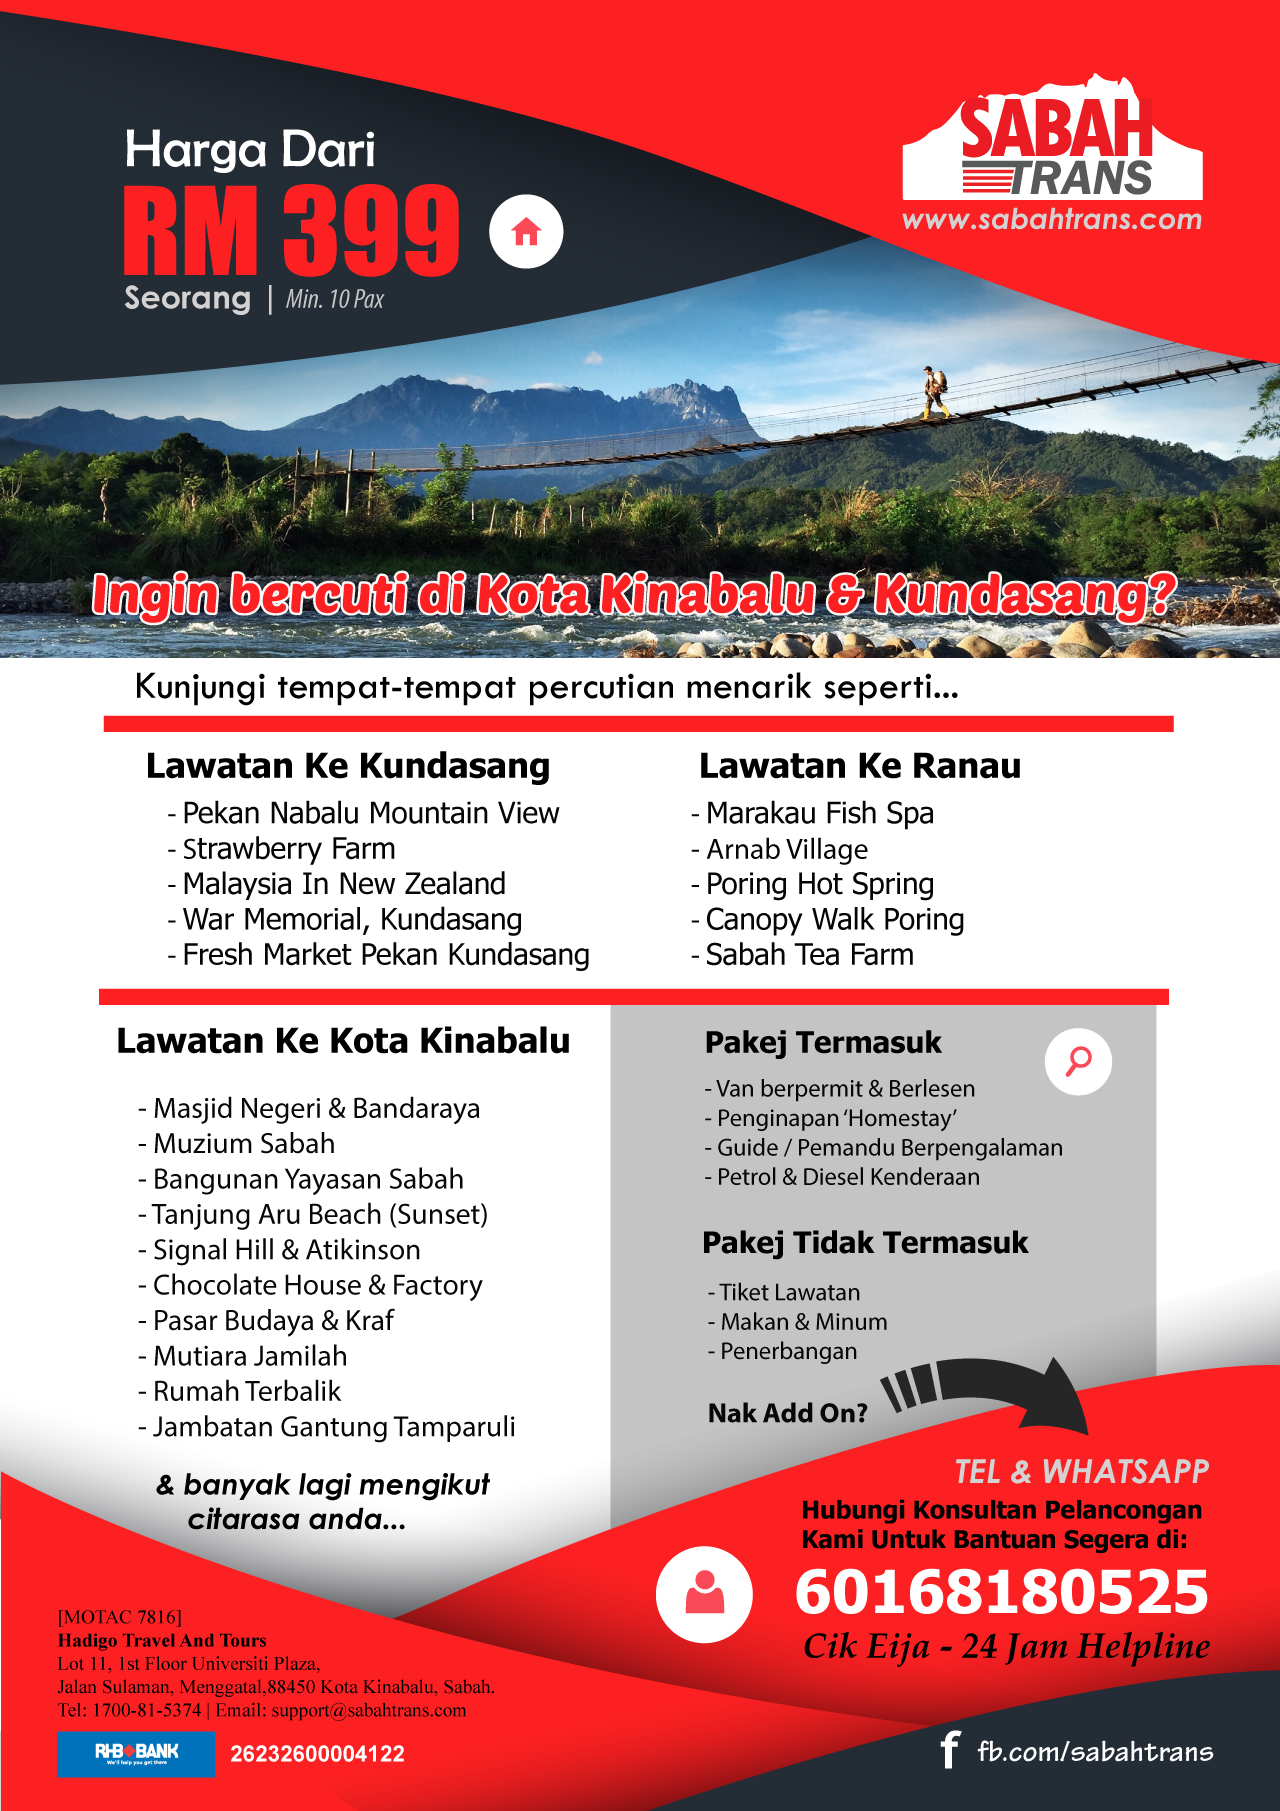 Bm Peluang Anda Dan Kumpulan Untuk Bercuti Di Kota Kinabalu Kundasang Sabah Www Sabahtrans Com Car Lease Sabah Tourism